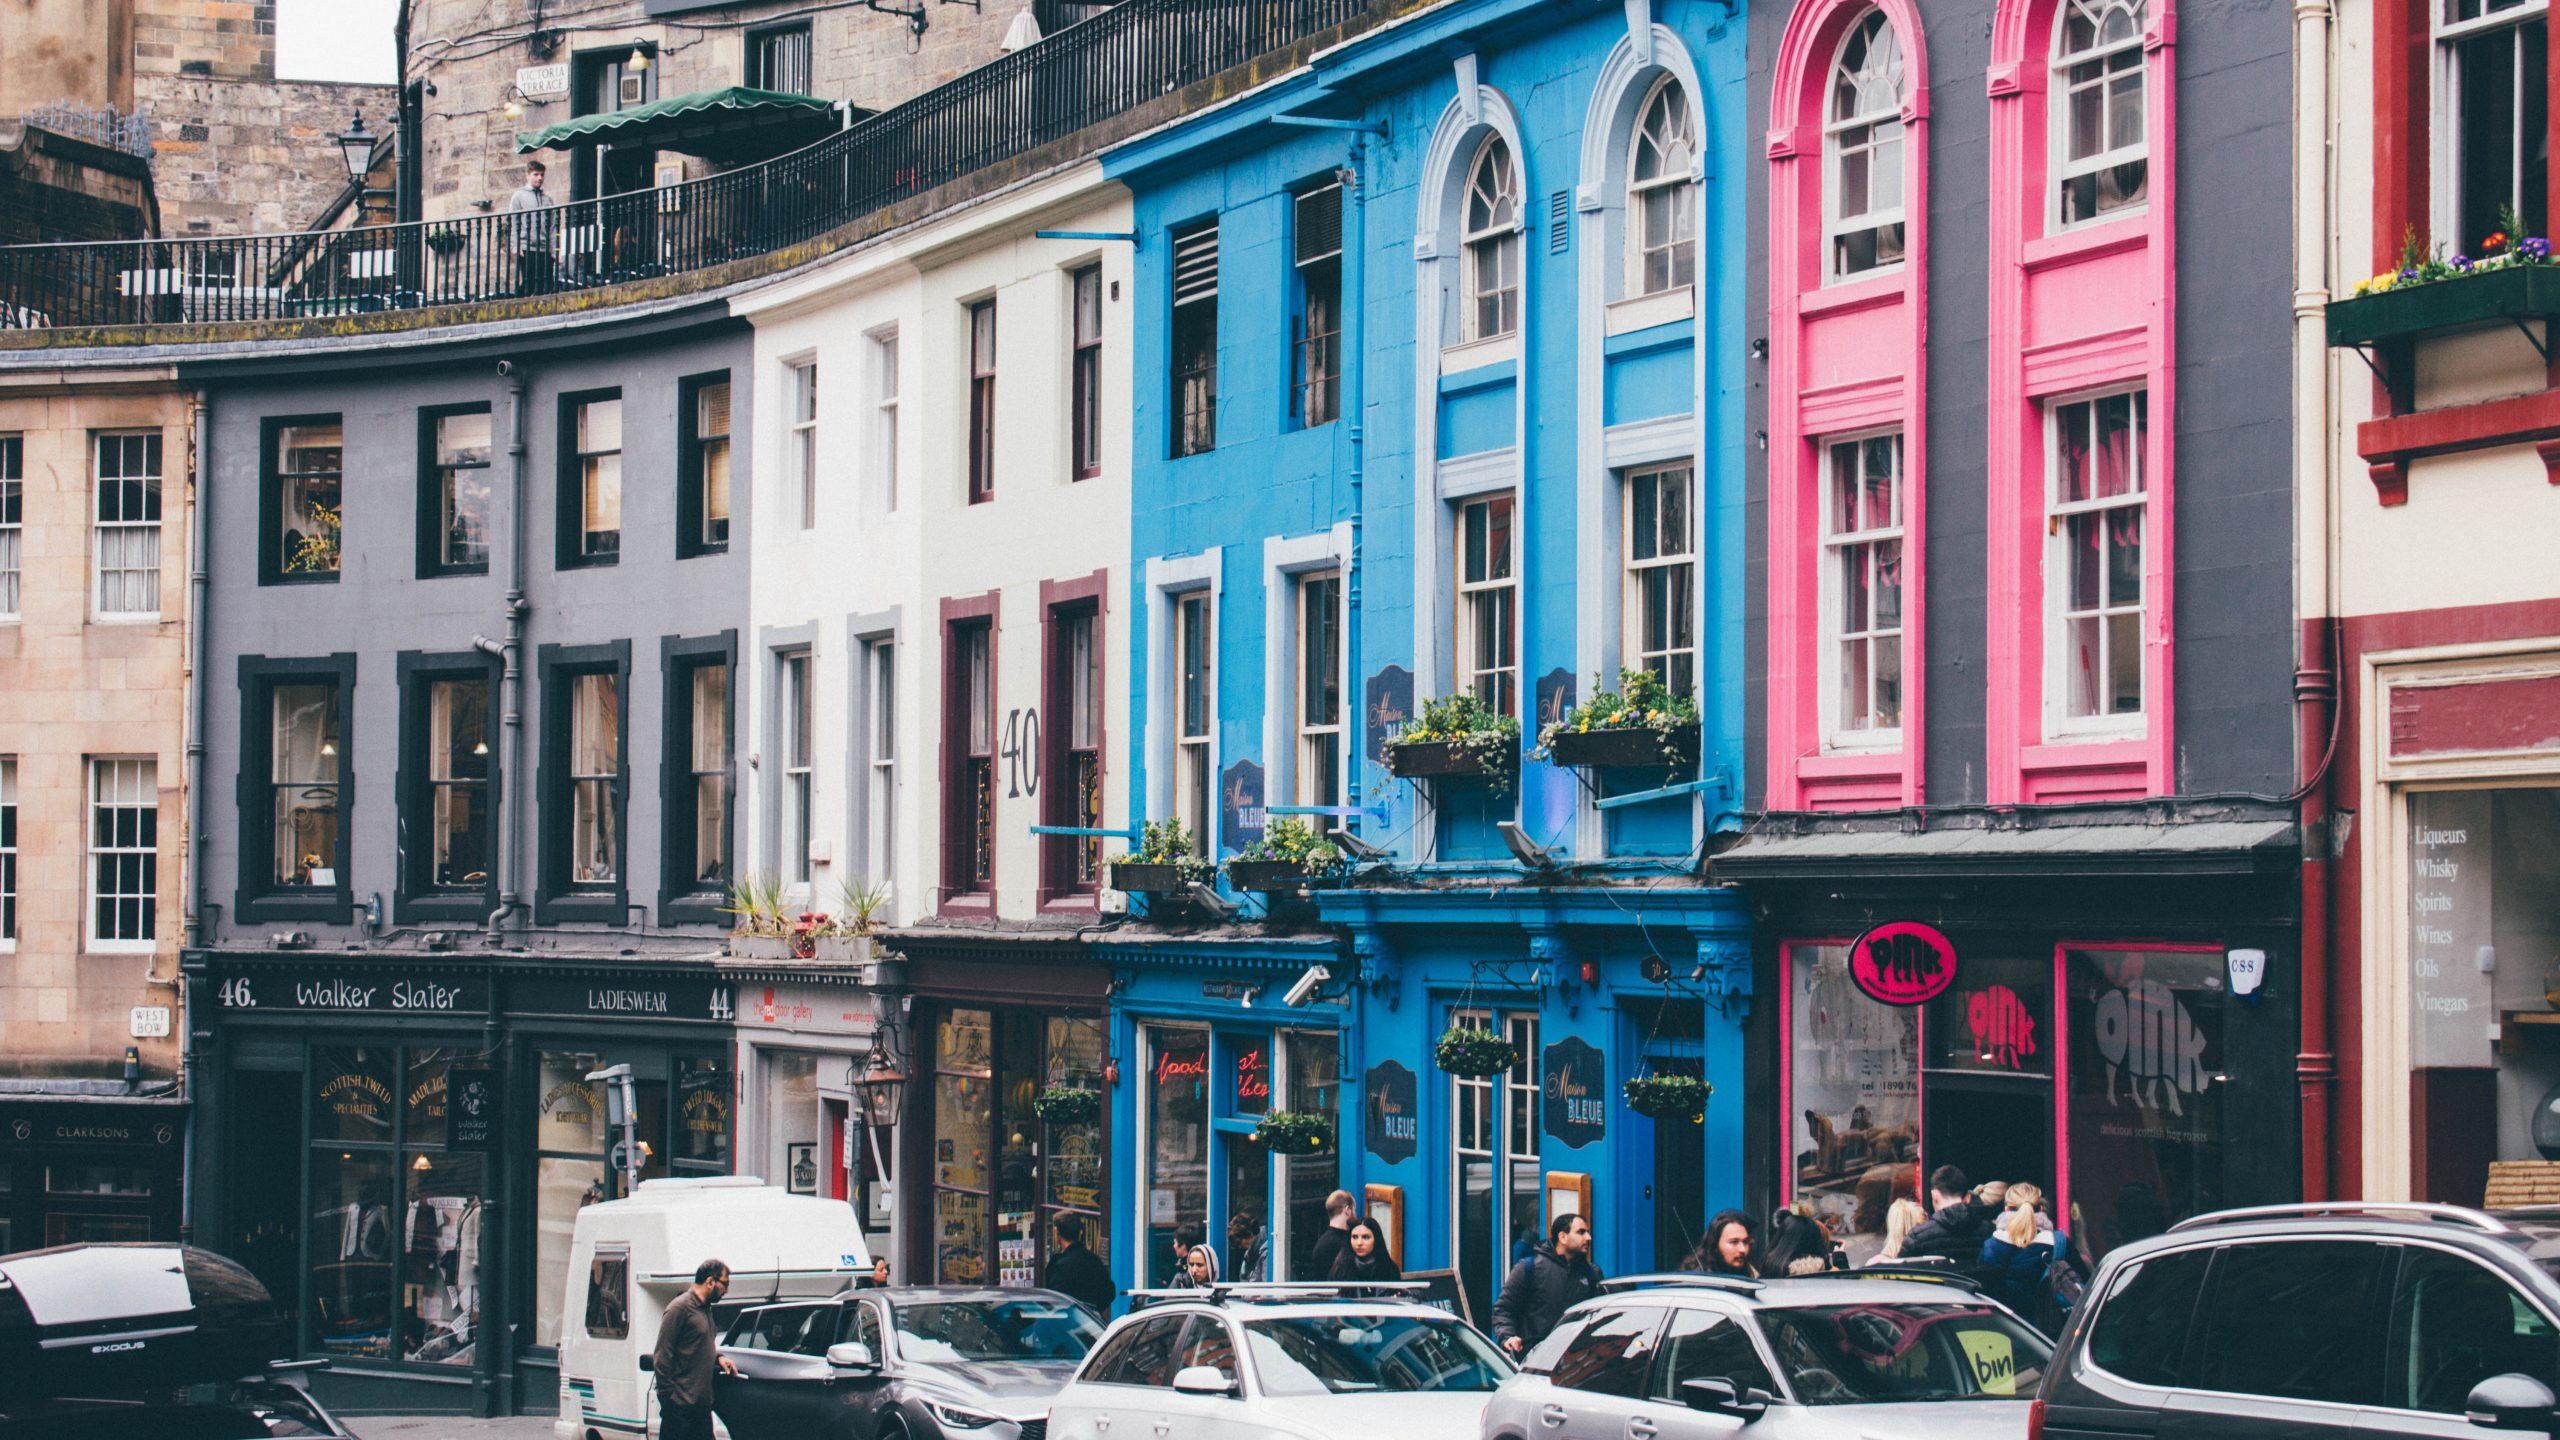 Victoria Street, Edinburgh - Unpslash.com